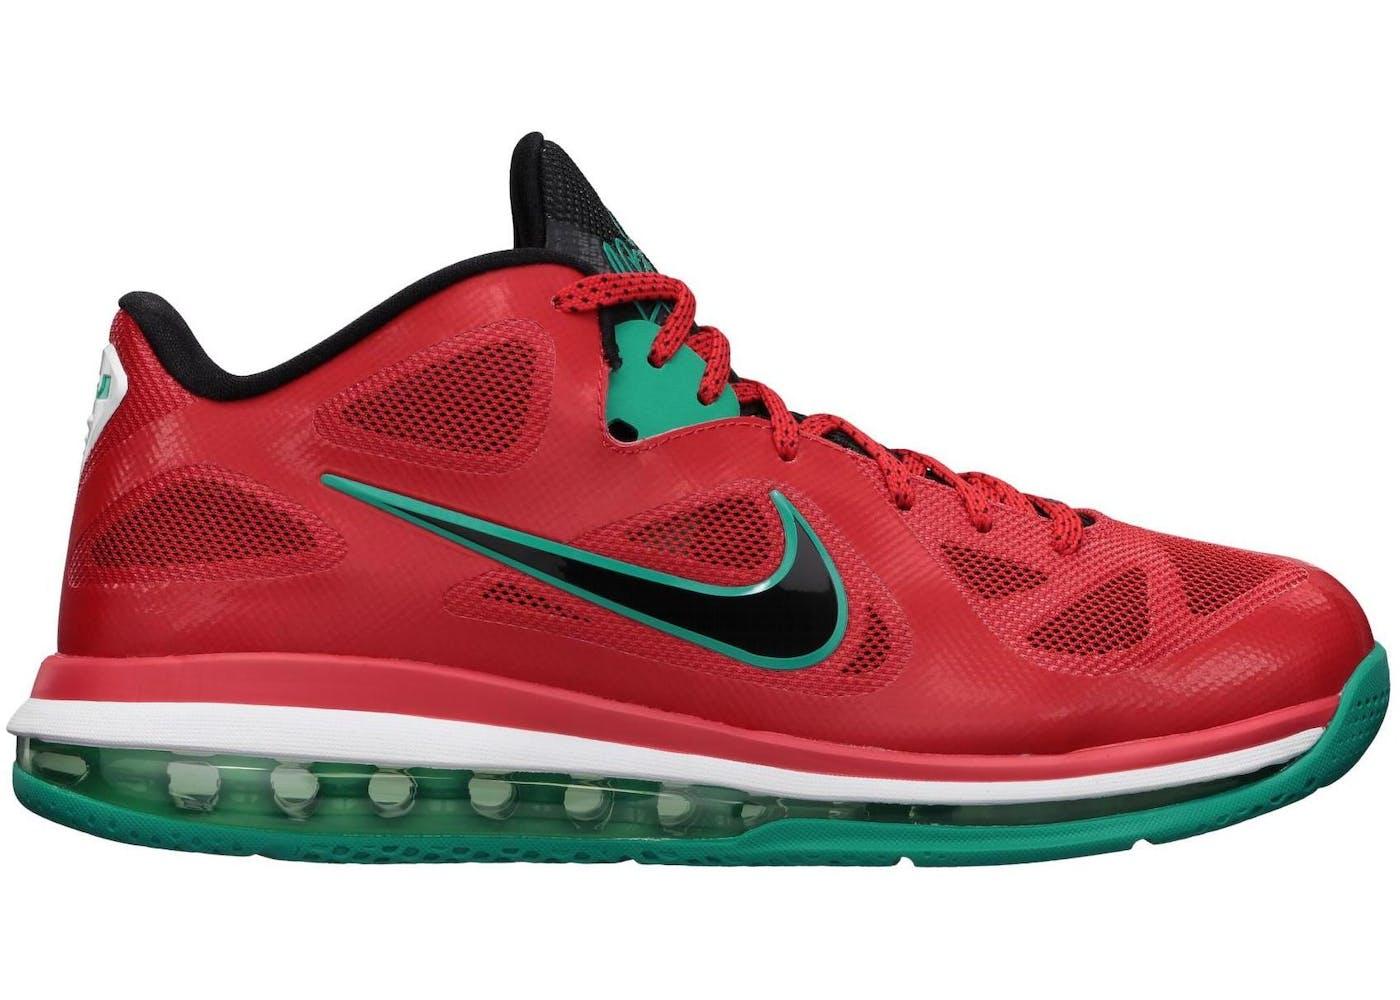 meet 04f25 2e3ed ... LeBron 9 Low Liverpool Nike ...